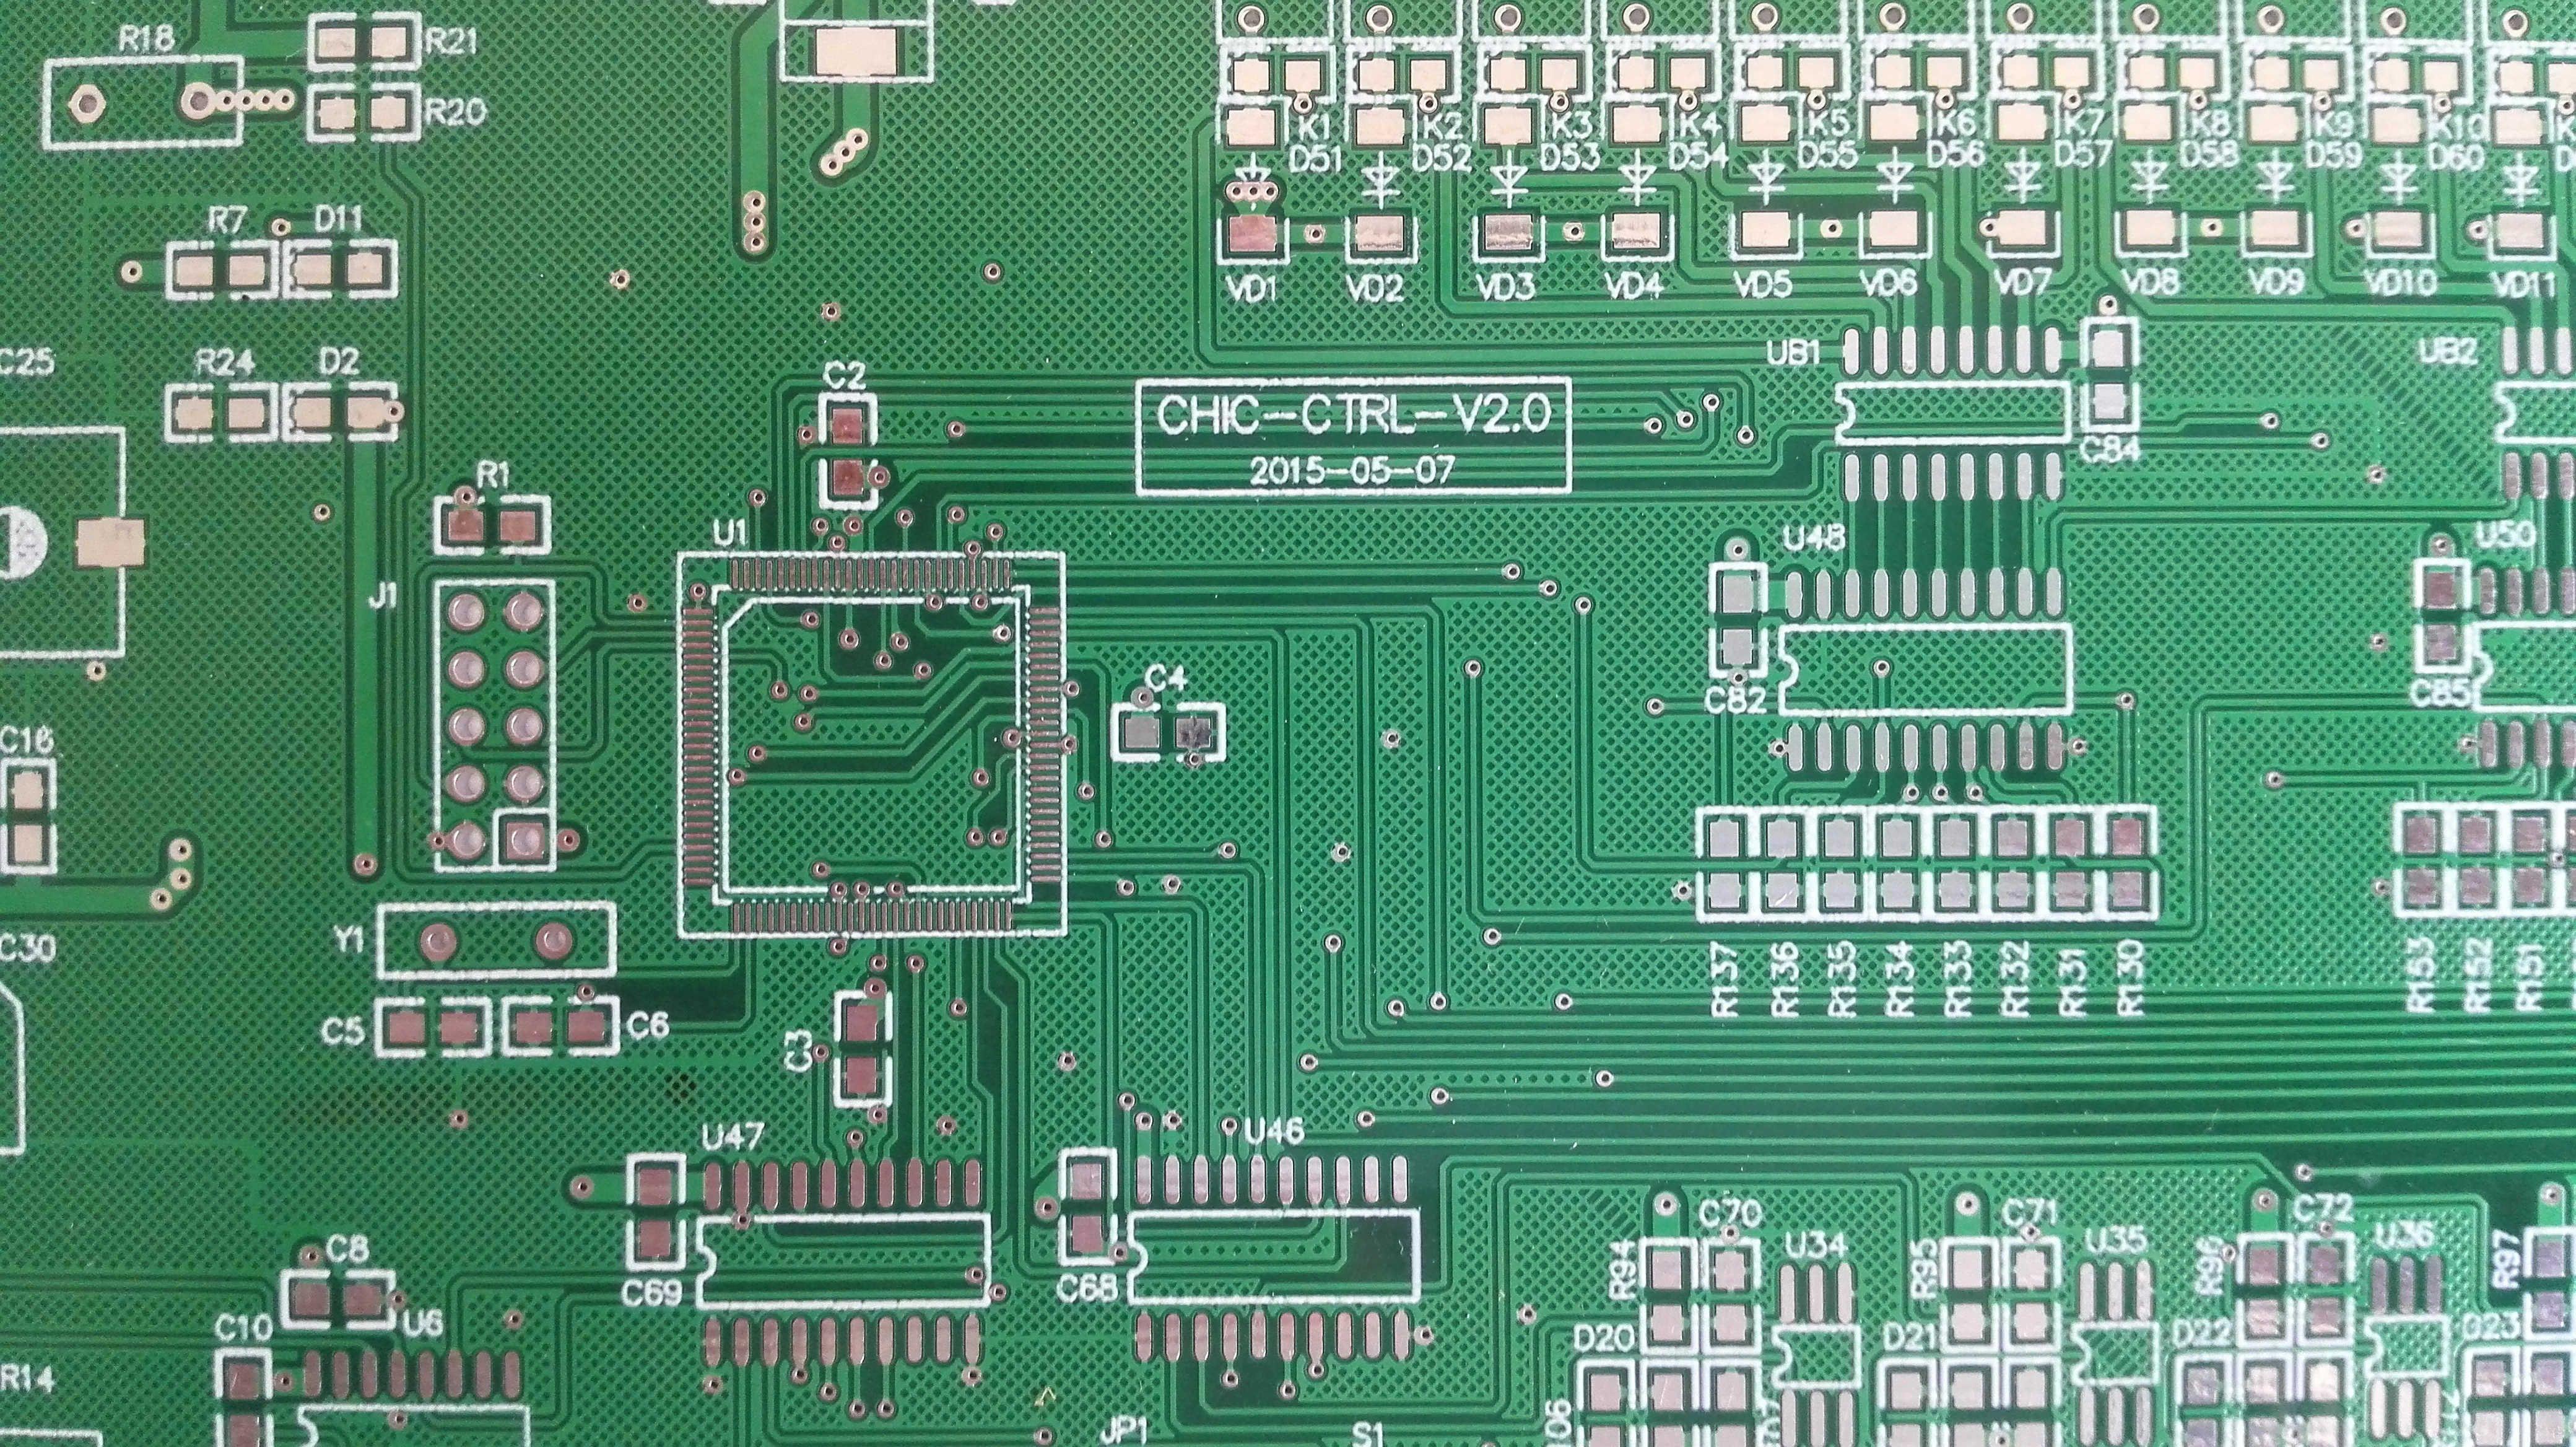 B Fr 4 6 Layer Blind Hole Pcb Board Custom Standard Spec Pcbpcba Rigidflex Circuit Boards Osp Lead Free Printed Rohs Oem Manufacturer Electonic From Sfr66 714